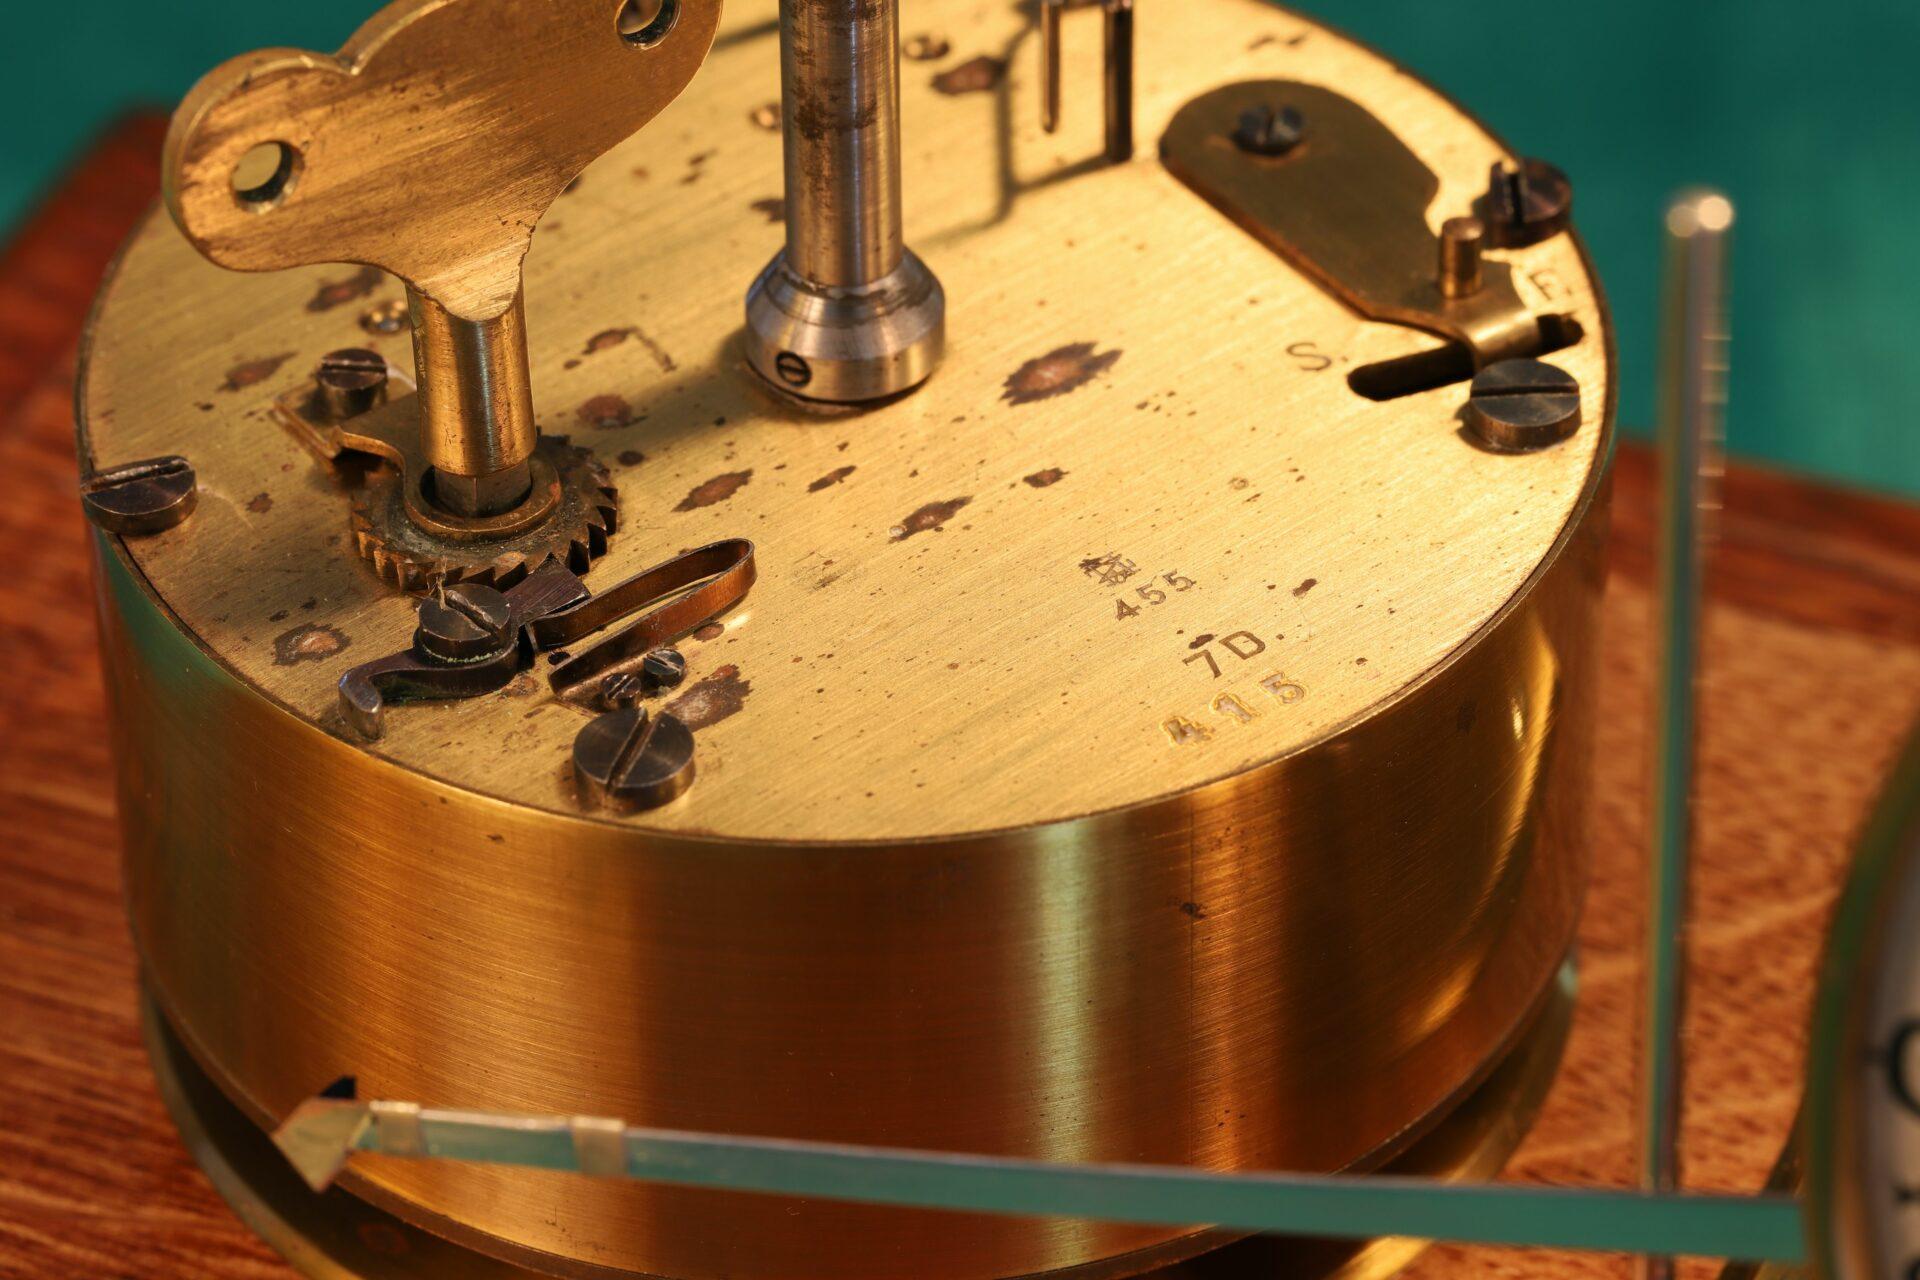 Close up of clockwork mechanism of Negretti & Zambra Barograph with Dial No 455 c1918